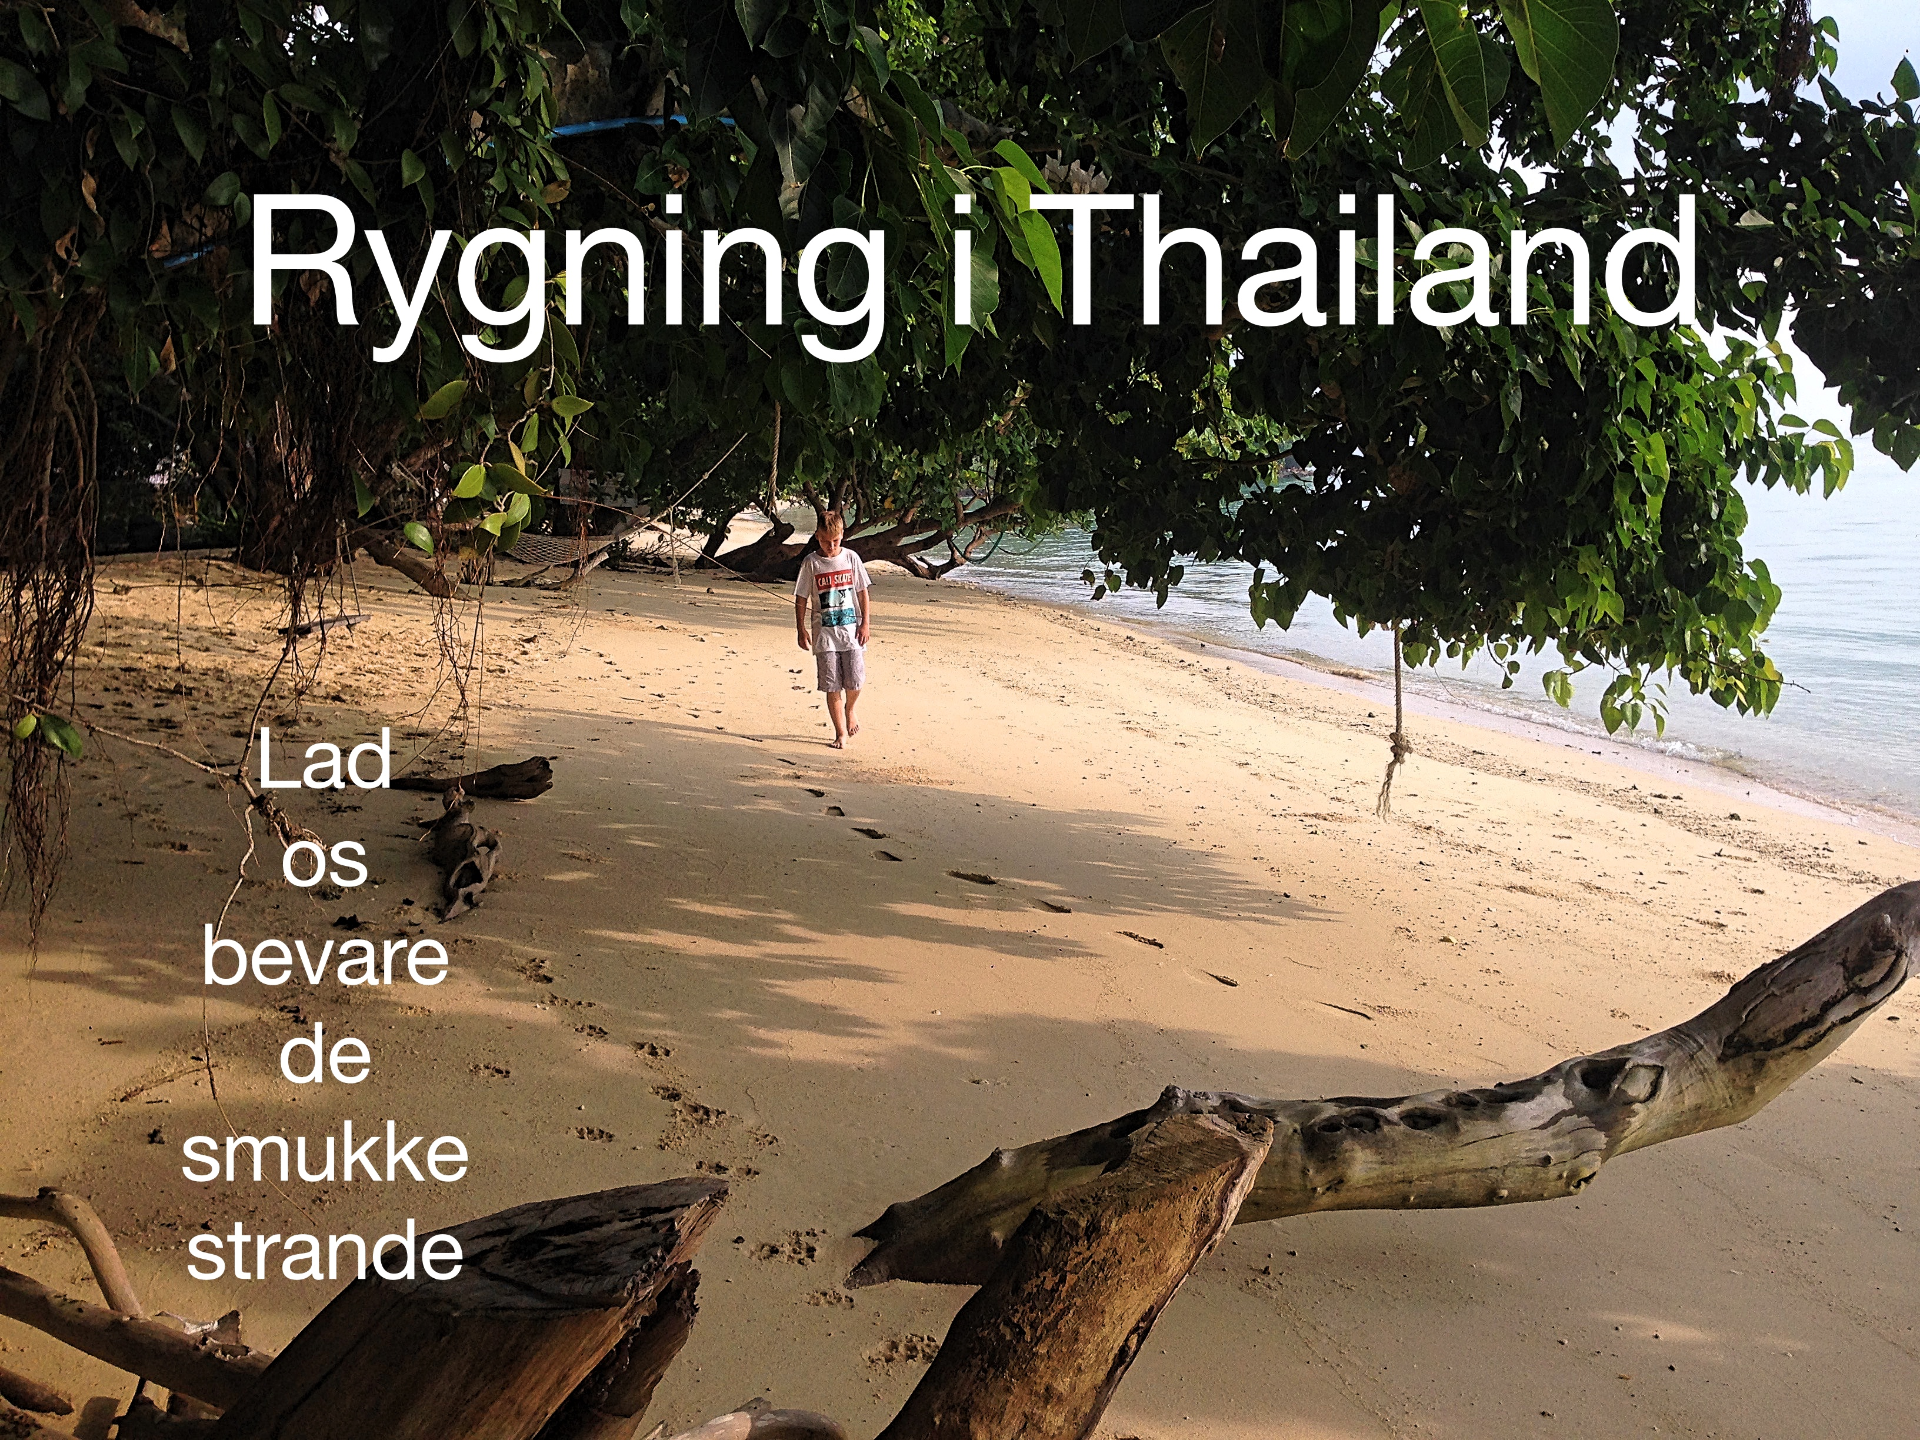 Rygning i Thailand – her er det forbudt at ryge på stranden